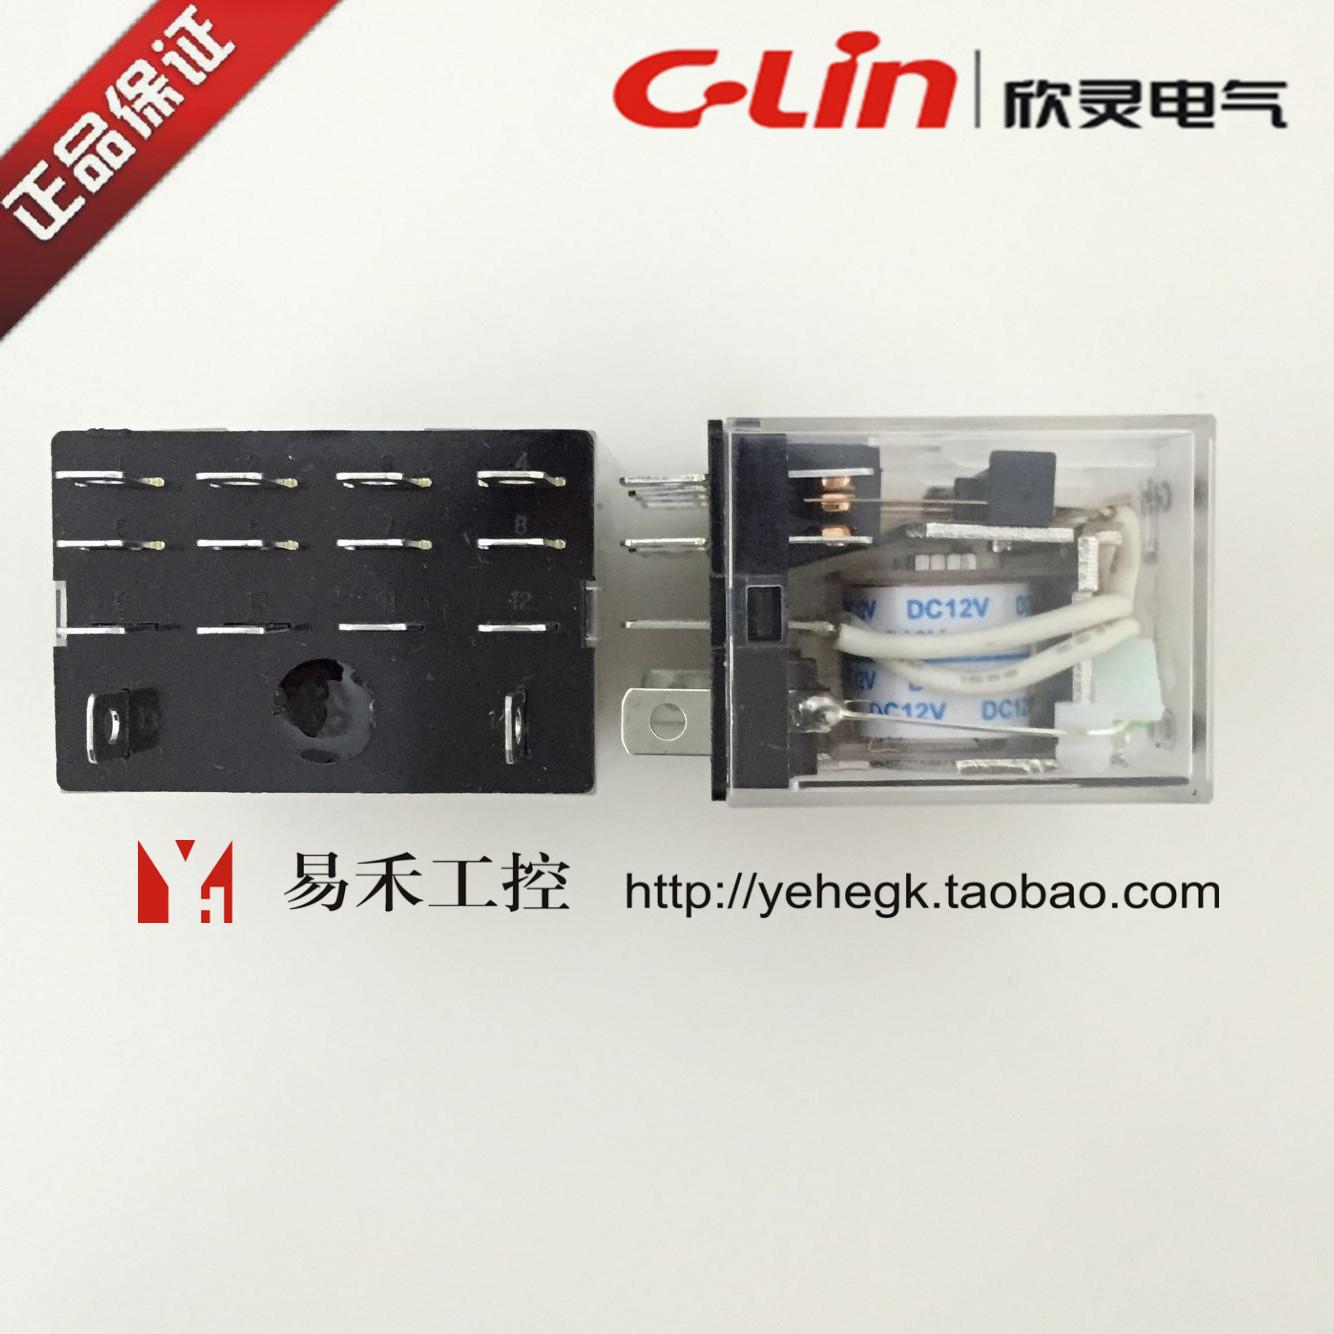 Yan Ling  HHC68A-4Z HH64P LY4N-JQX-13F DC12V/DC24V